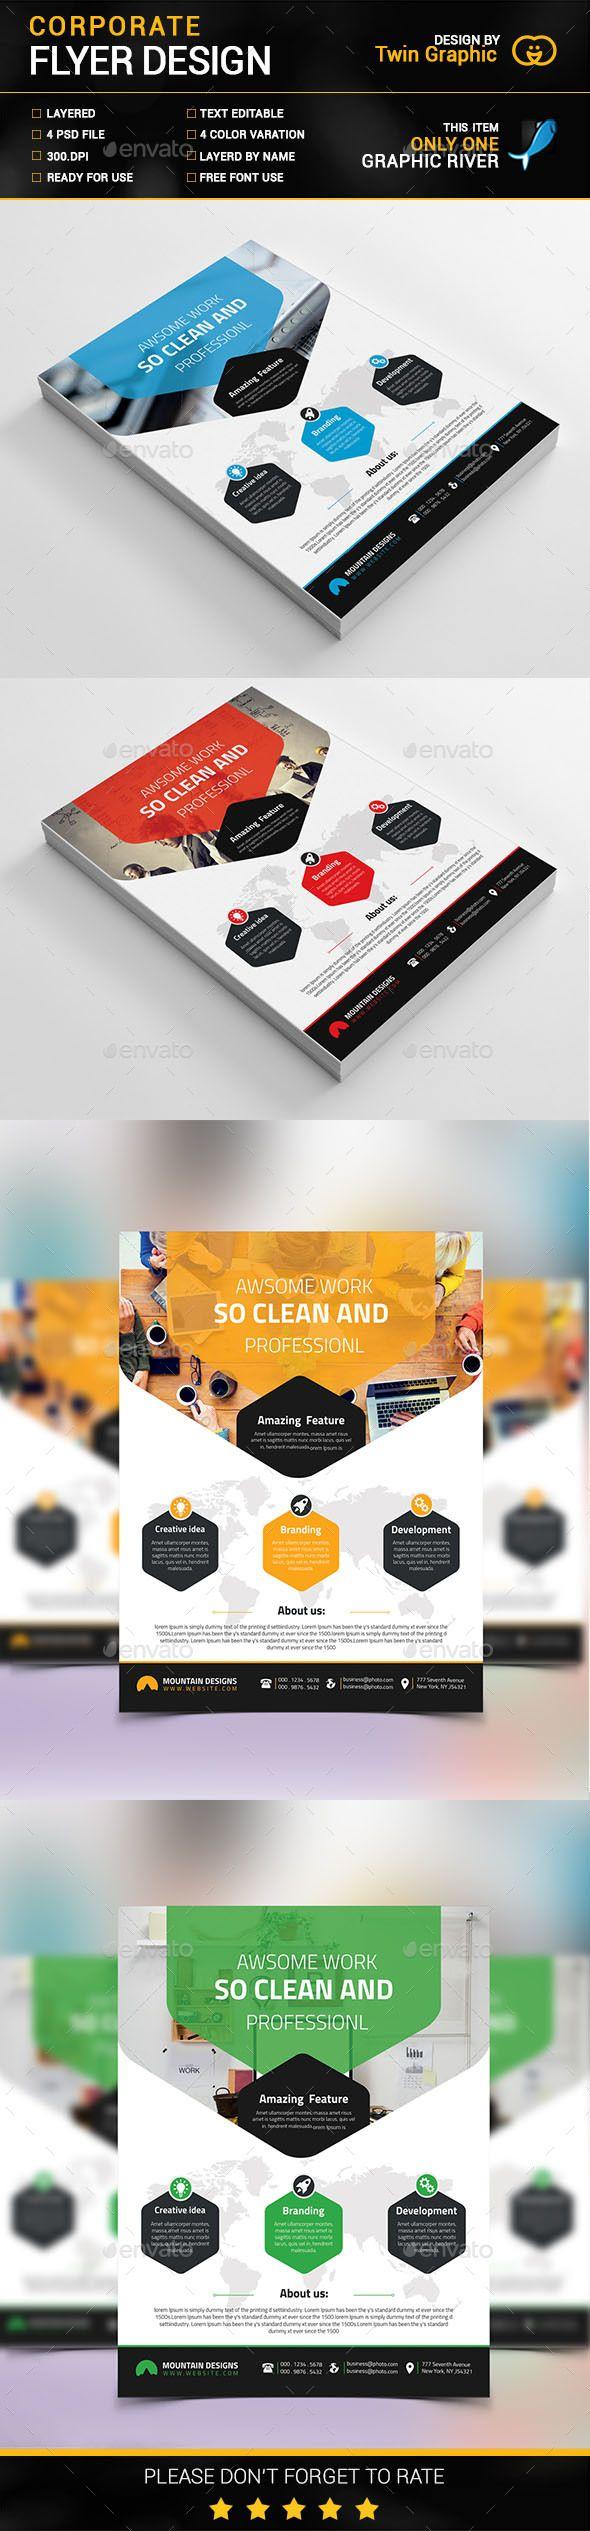 Corporate Flyer Design Template PSD. Download here: http://graphicriver.net/item/-corporate-flyer-design/15621732?ref=ksioks